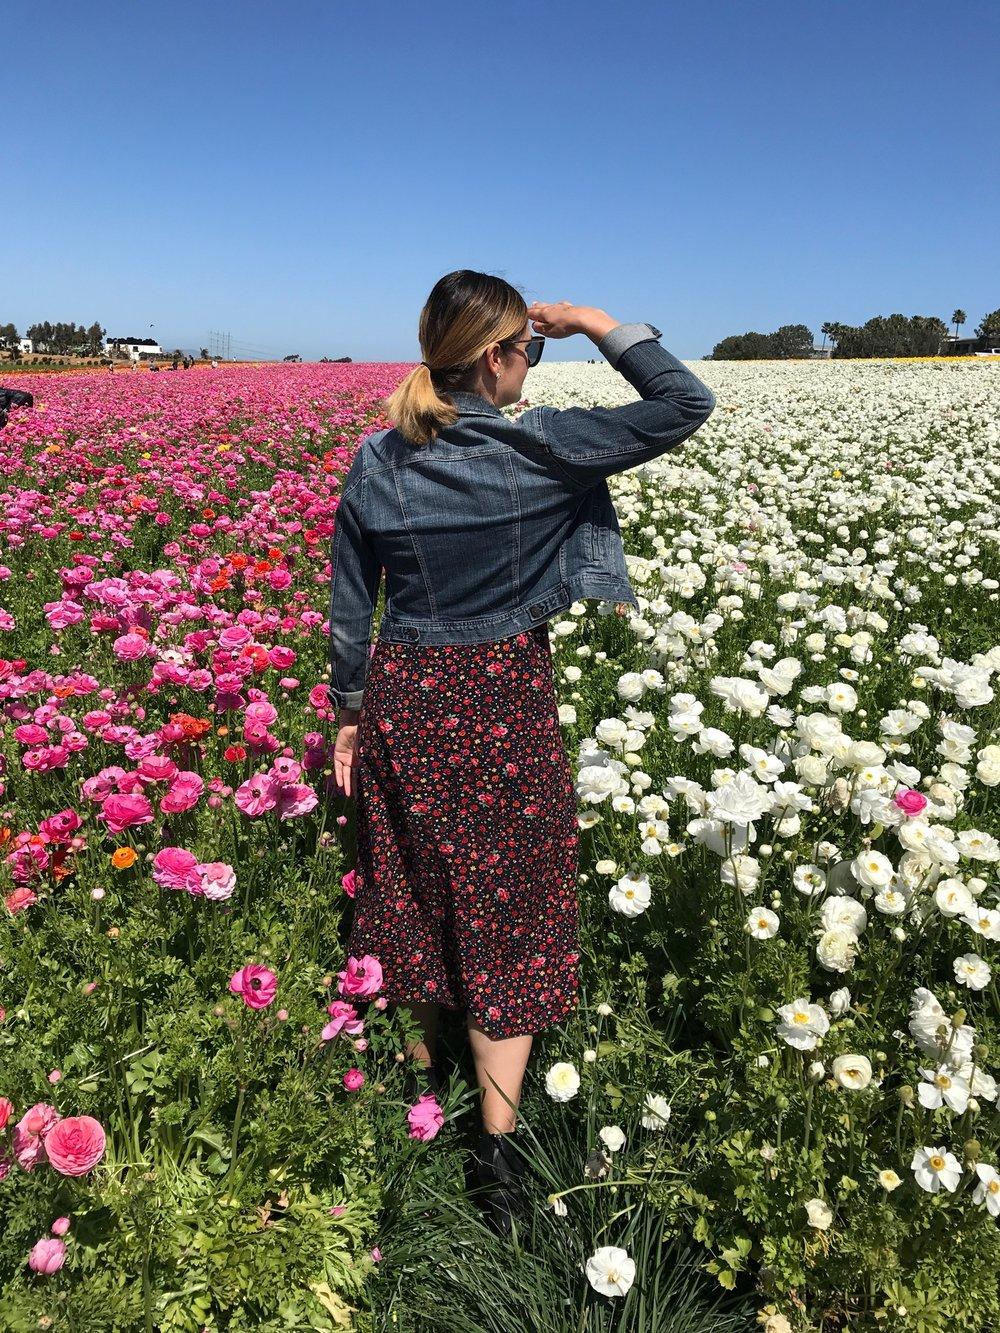 Frolicking in the Carlsbad Flower Fields